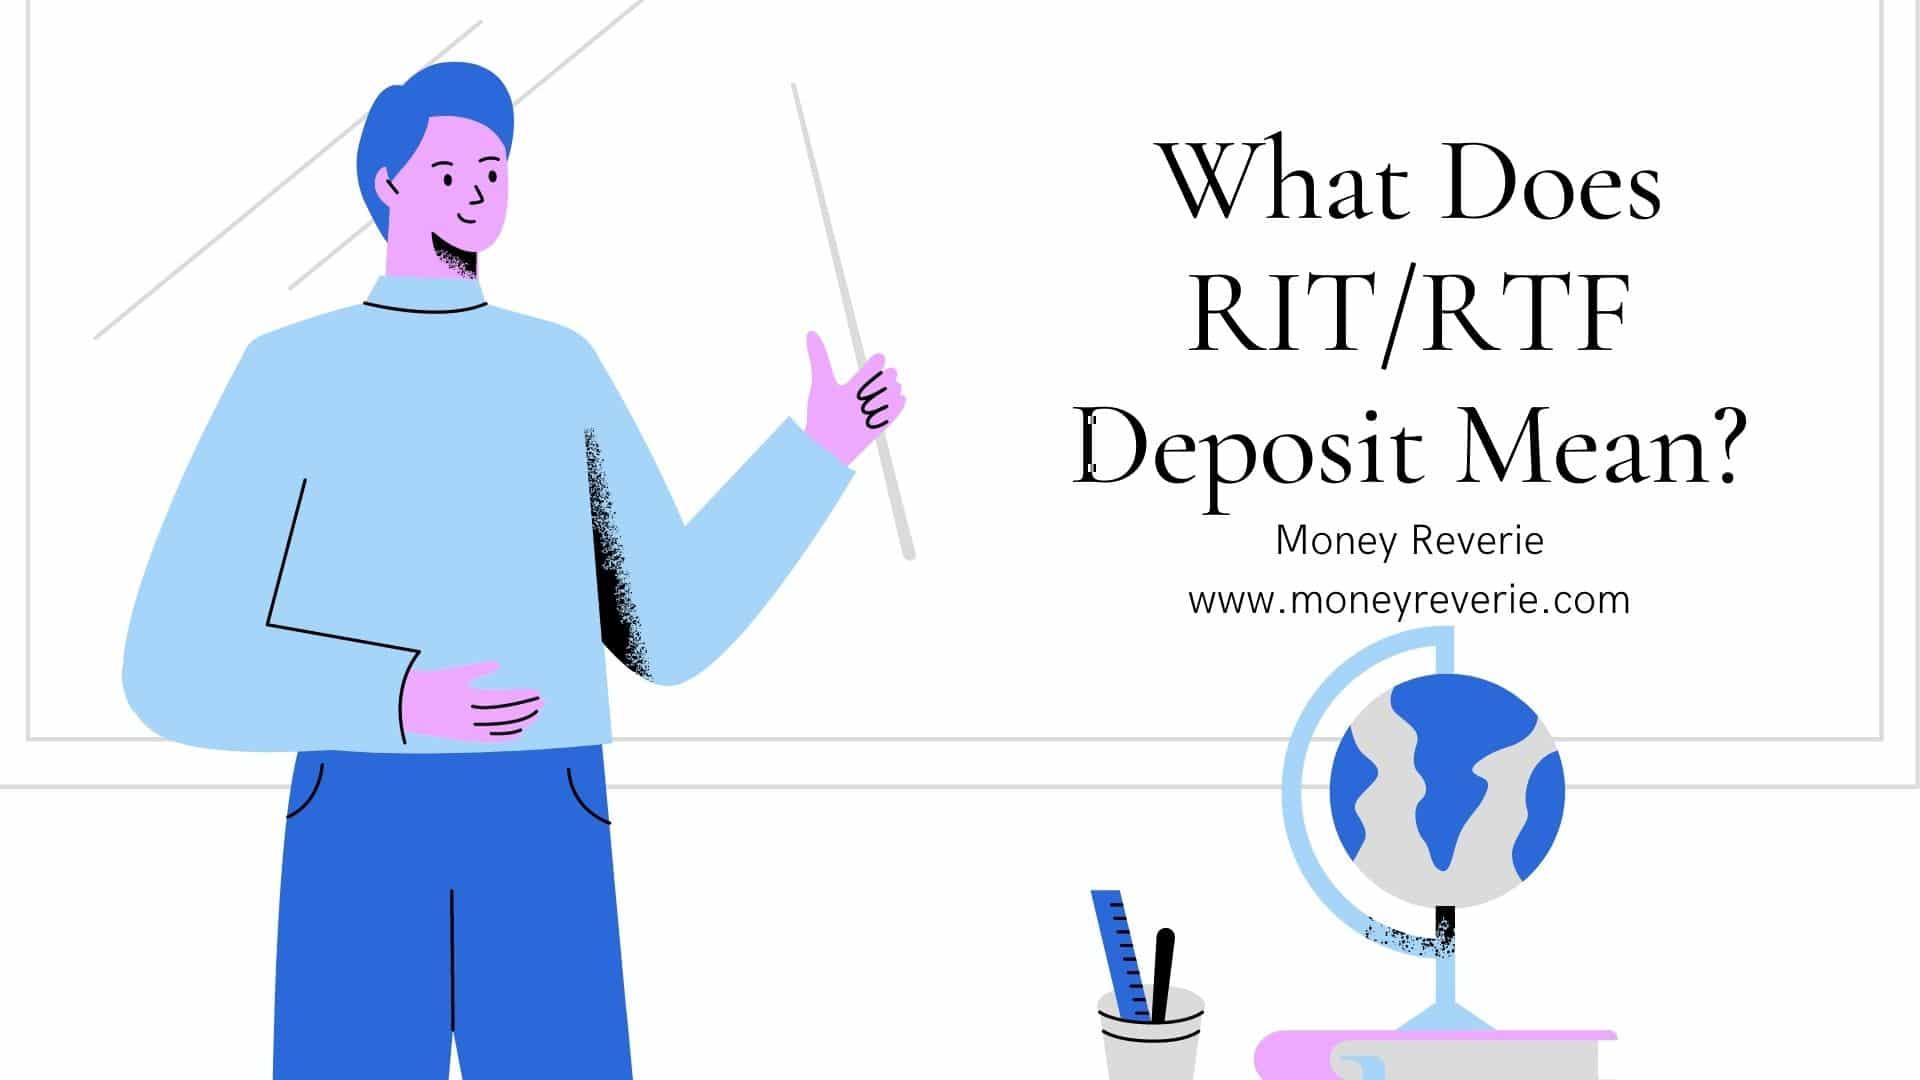 What Does RIT/RTF Deposit Mean?